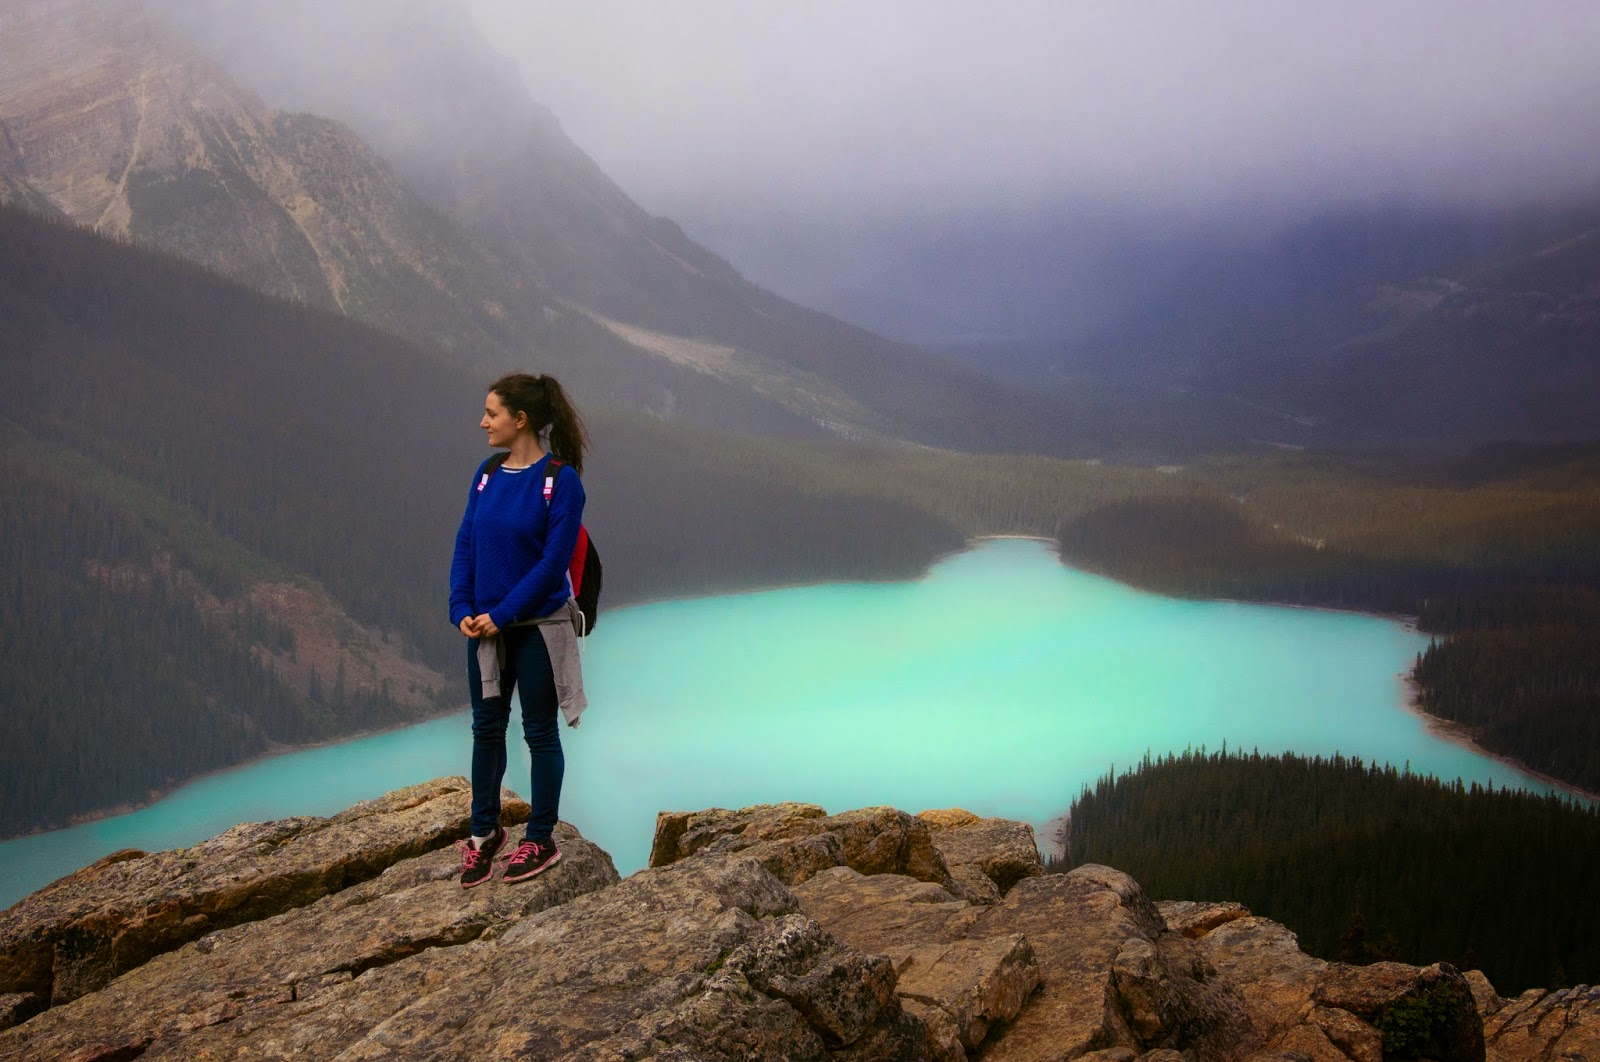 peyto lake, canada, alberta